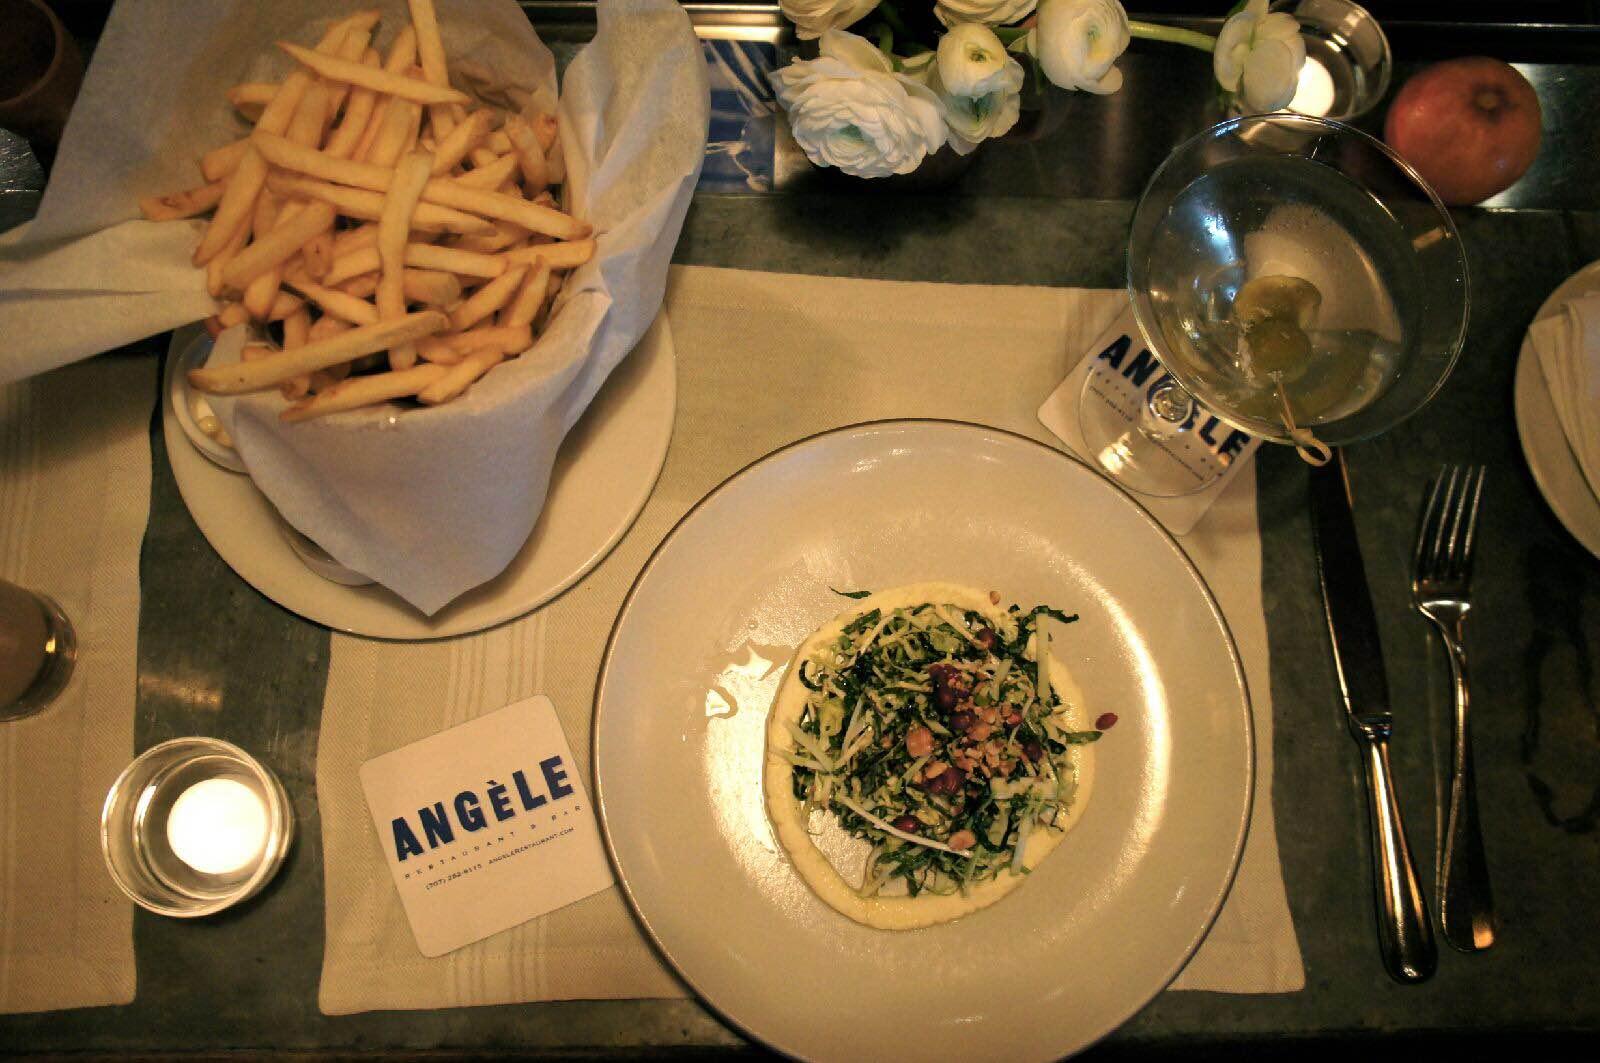 Kale Salad, pomegranate, hazelnut, fresh handmade ricotta and vinagrette + French fries + vodka martini and blue cheese olives = happy hour ❤️